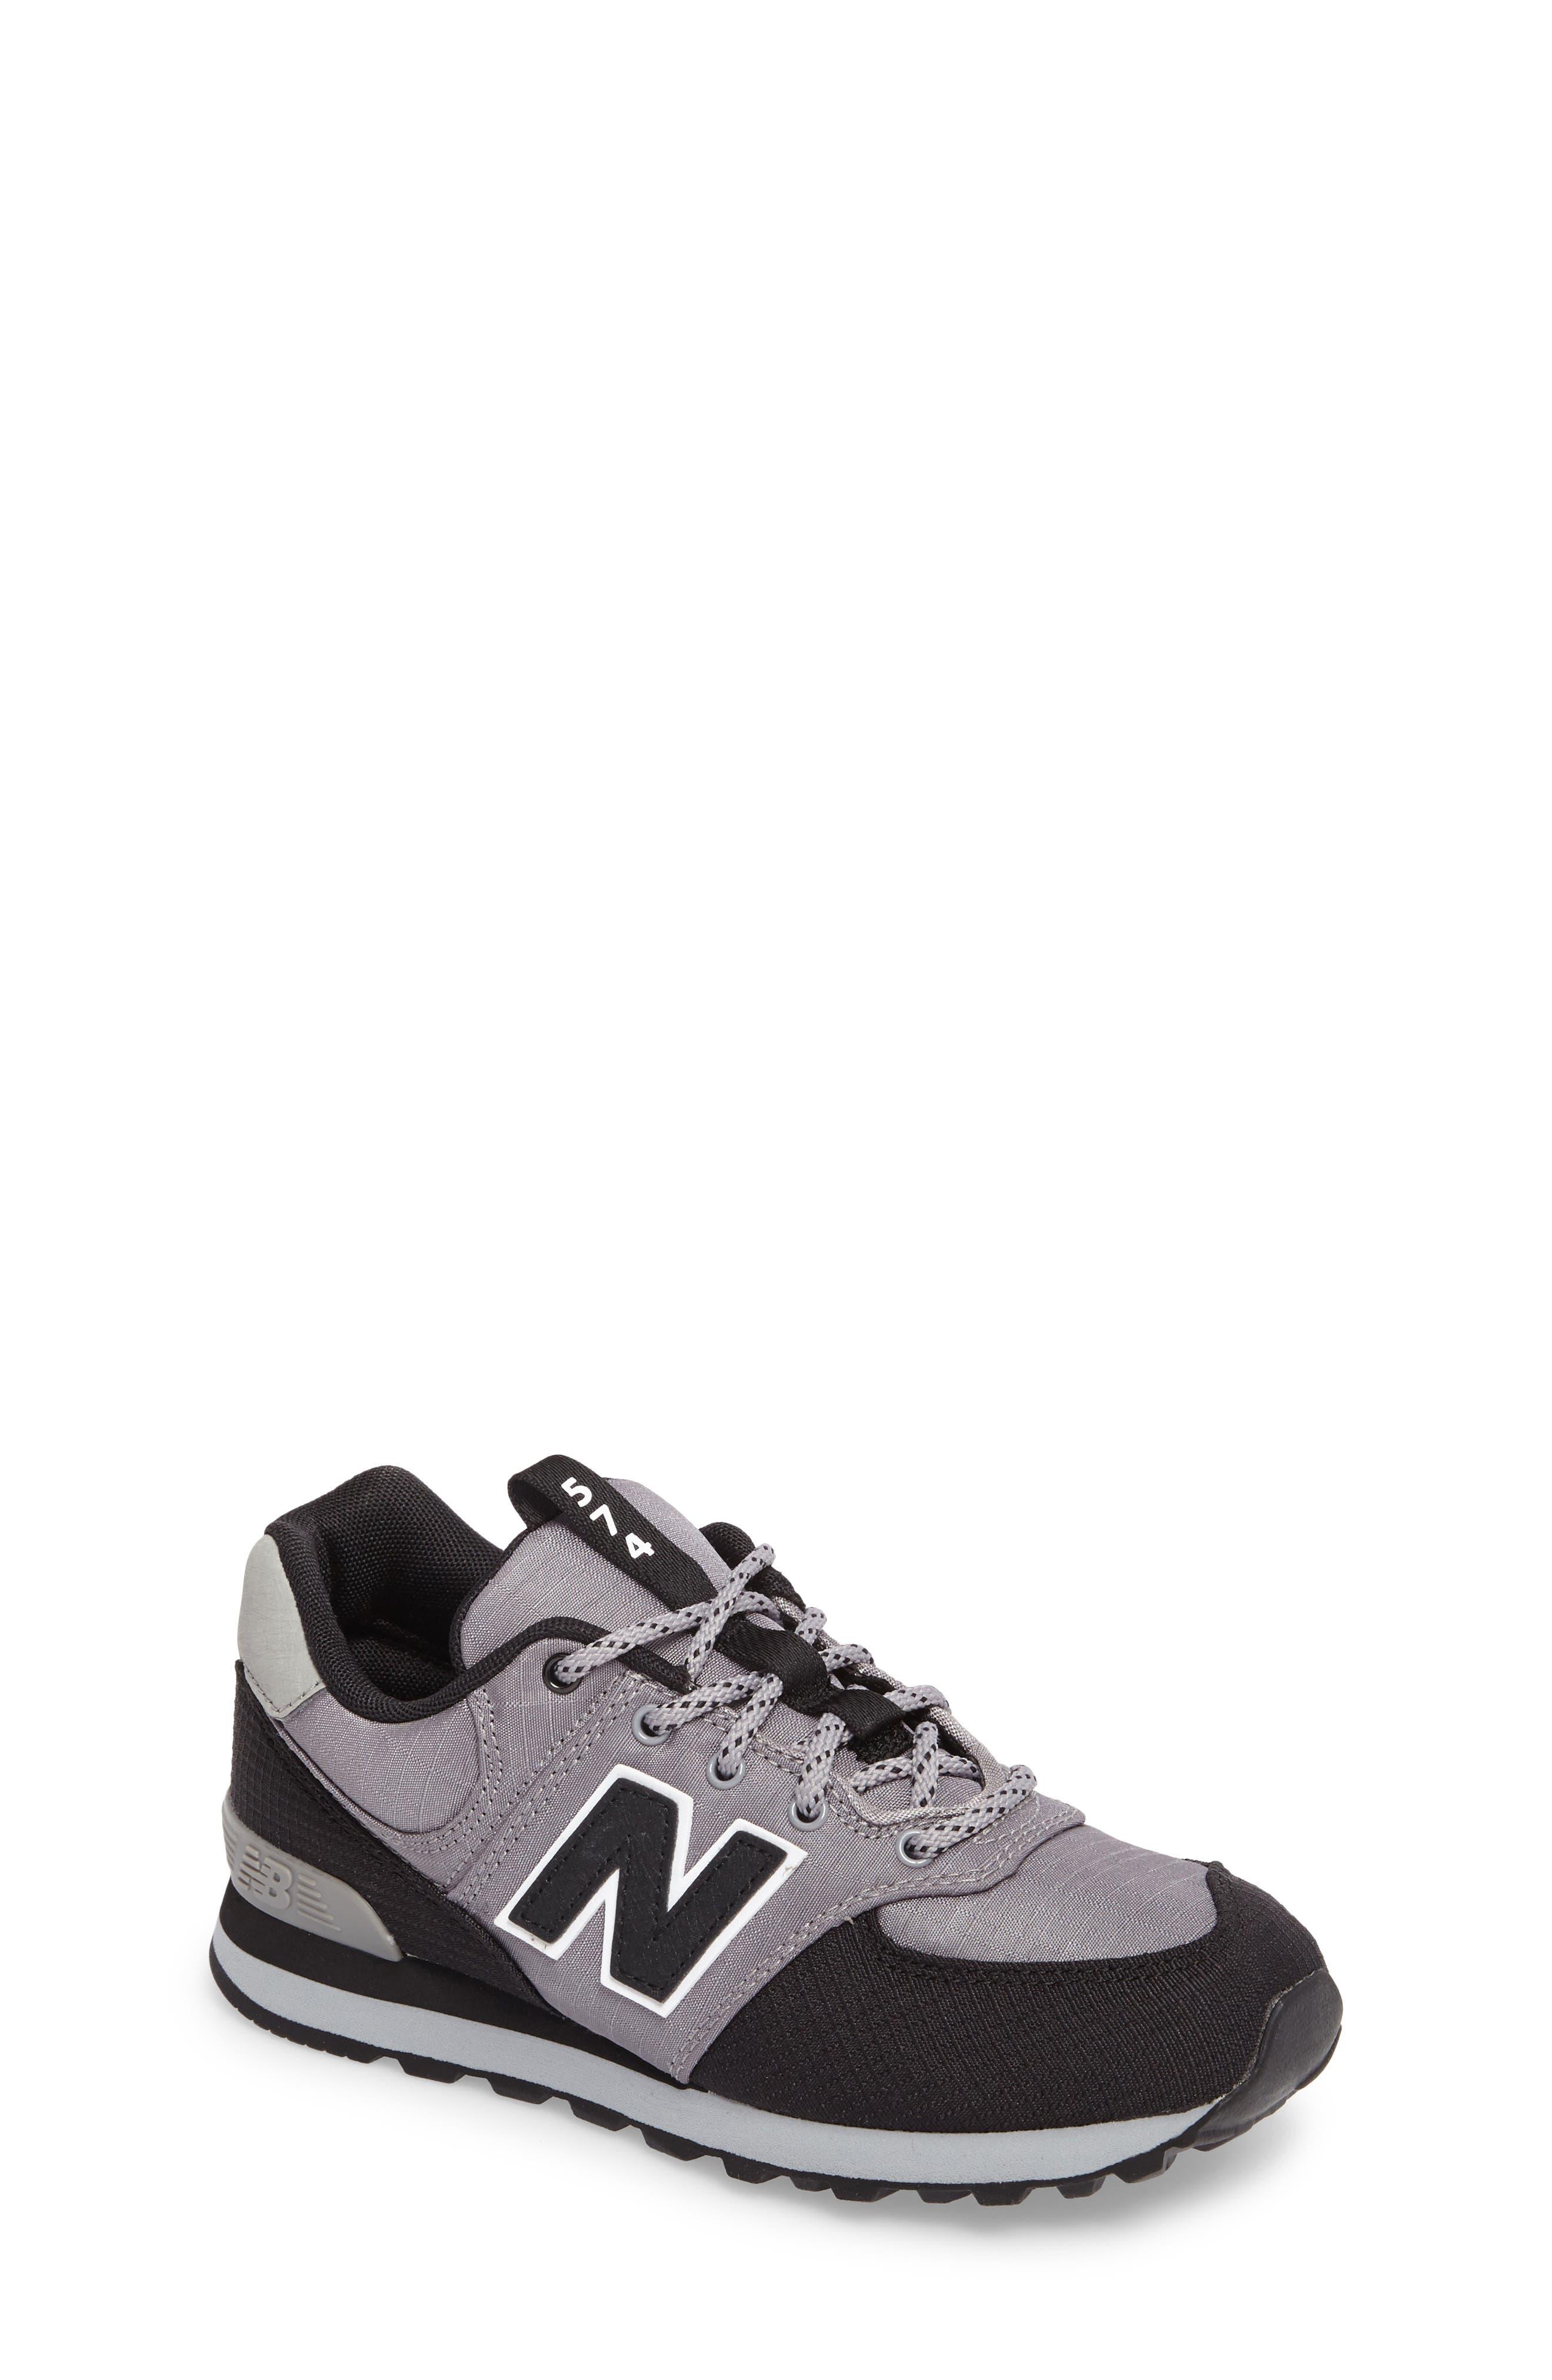 New Balance 574 Sport Sneaker (Baby, Walker, Toddler, Little Kid & Big Kid)